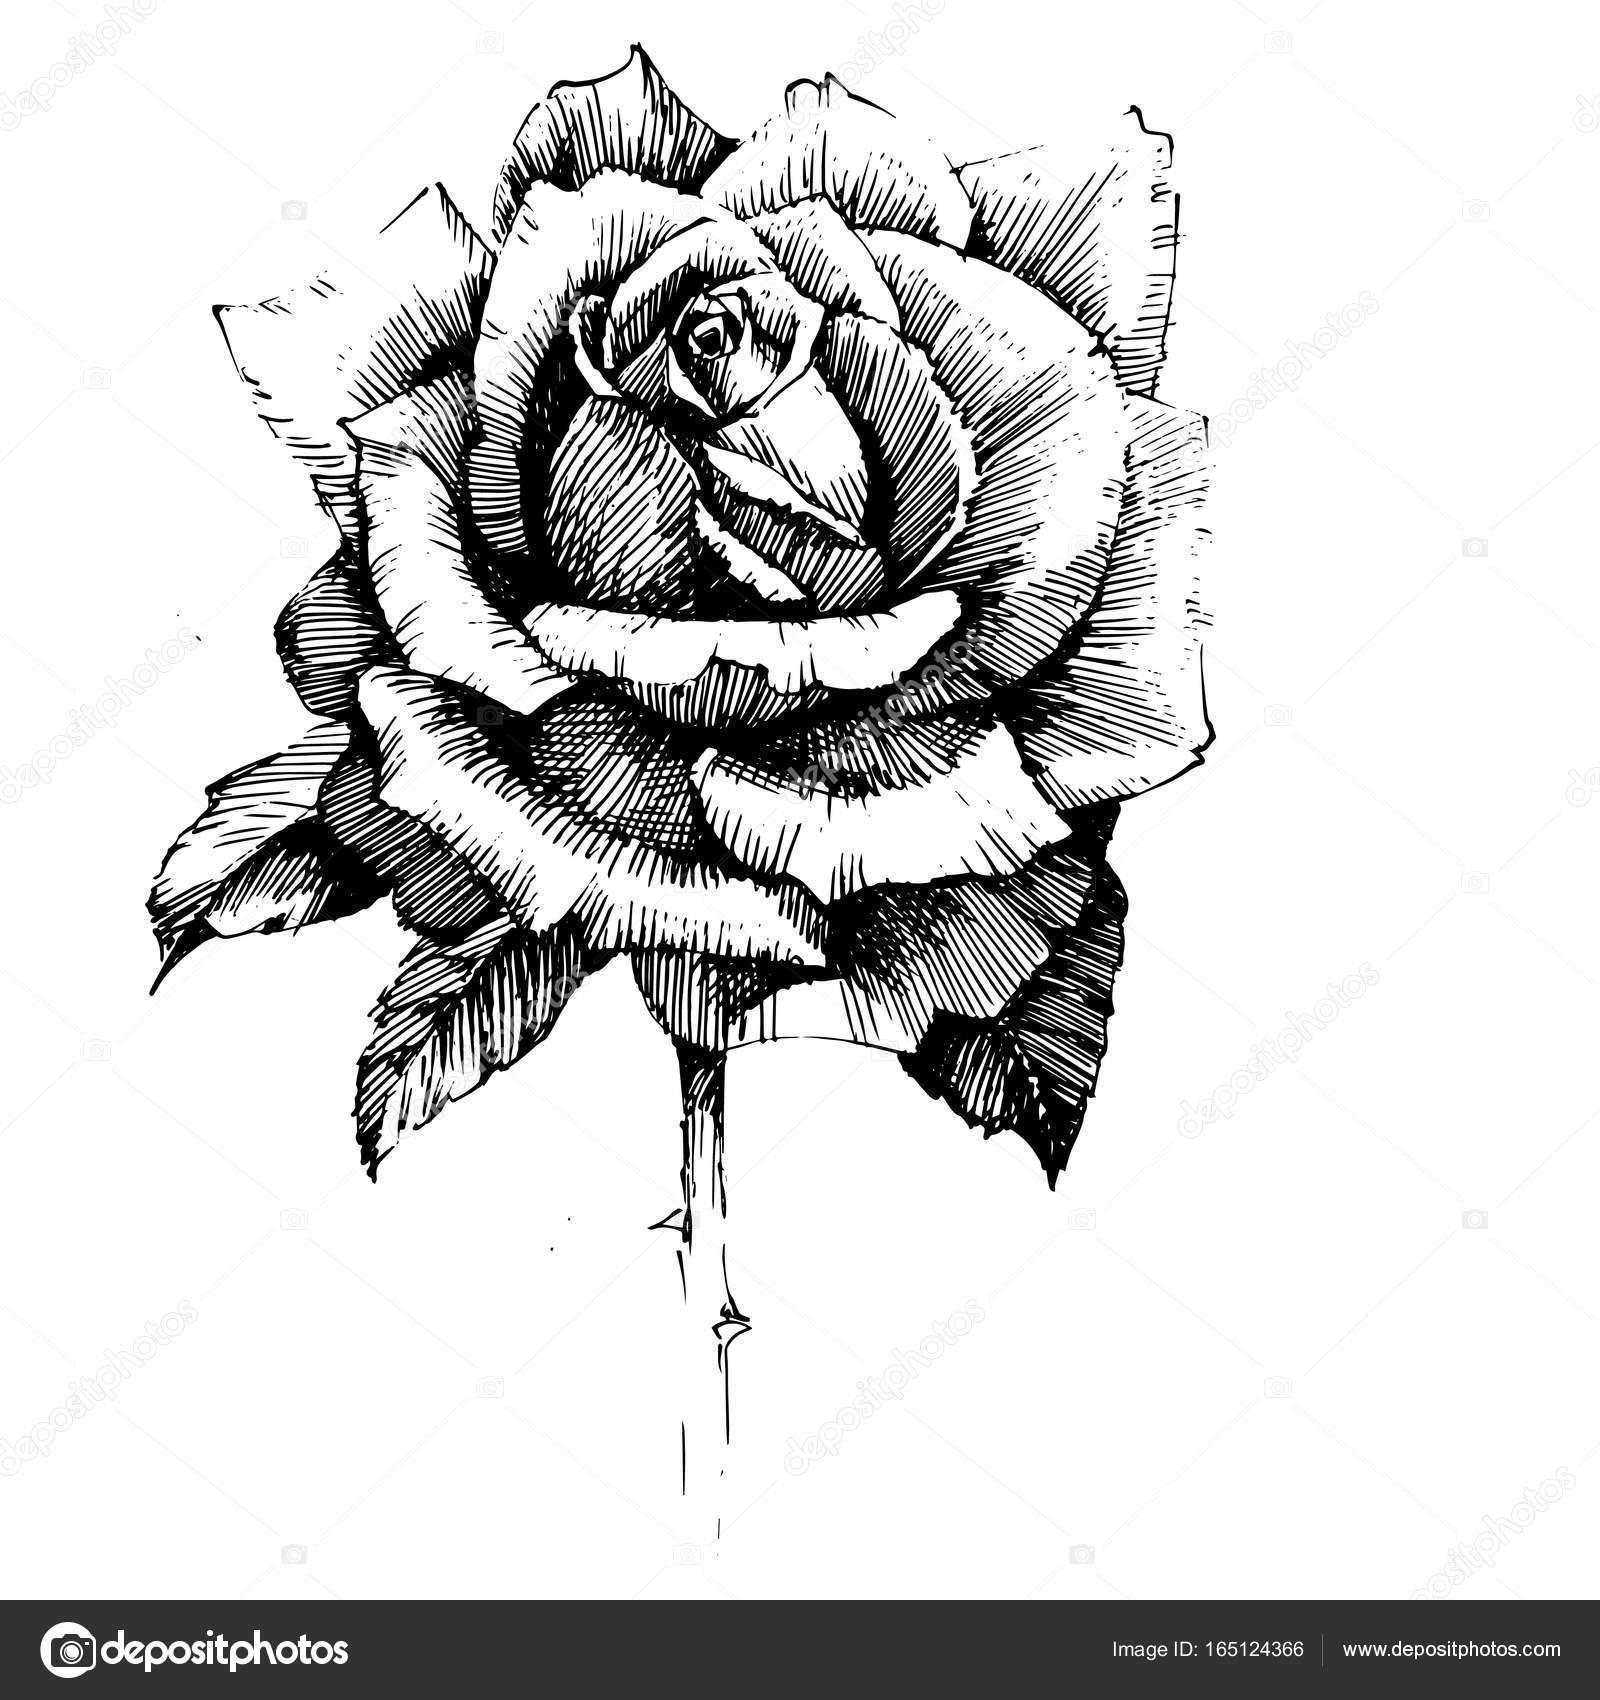 Dessin Fleurs Rose Ink Image Vectorielle Acantstudio C 165124366